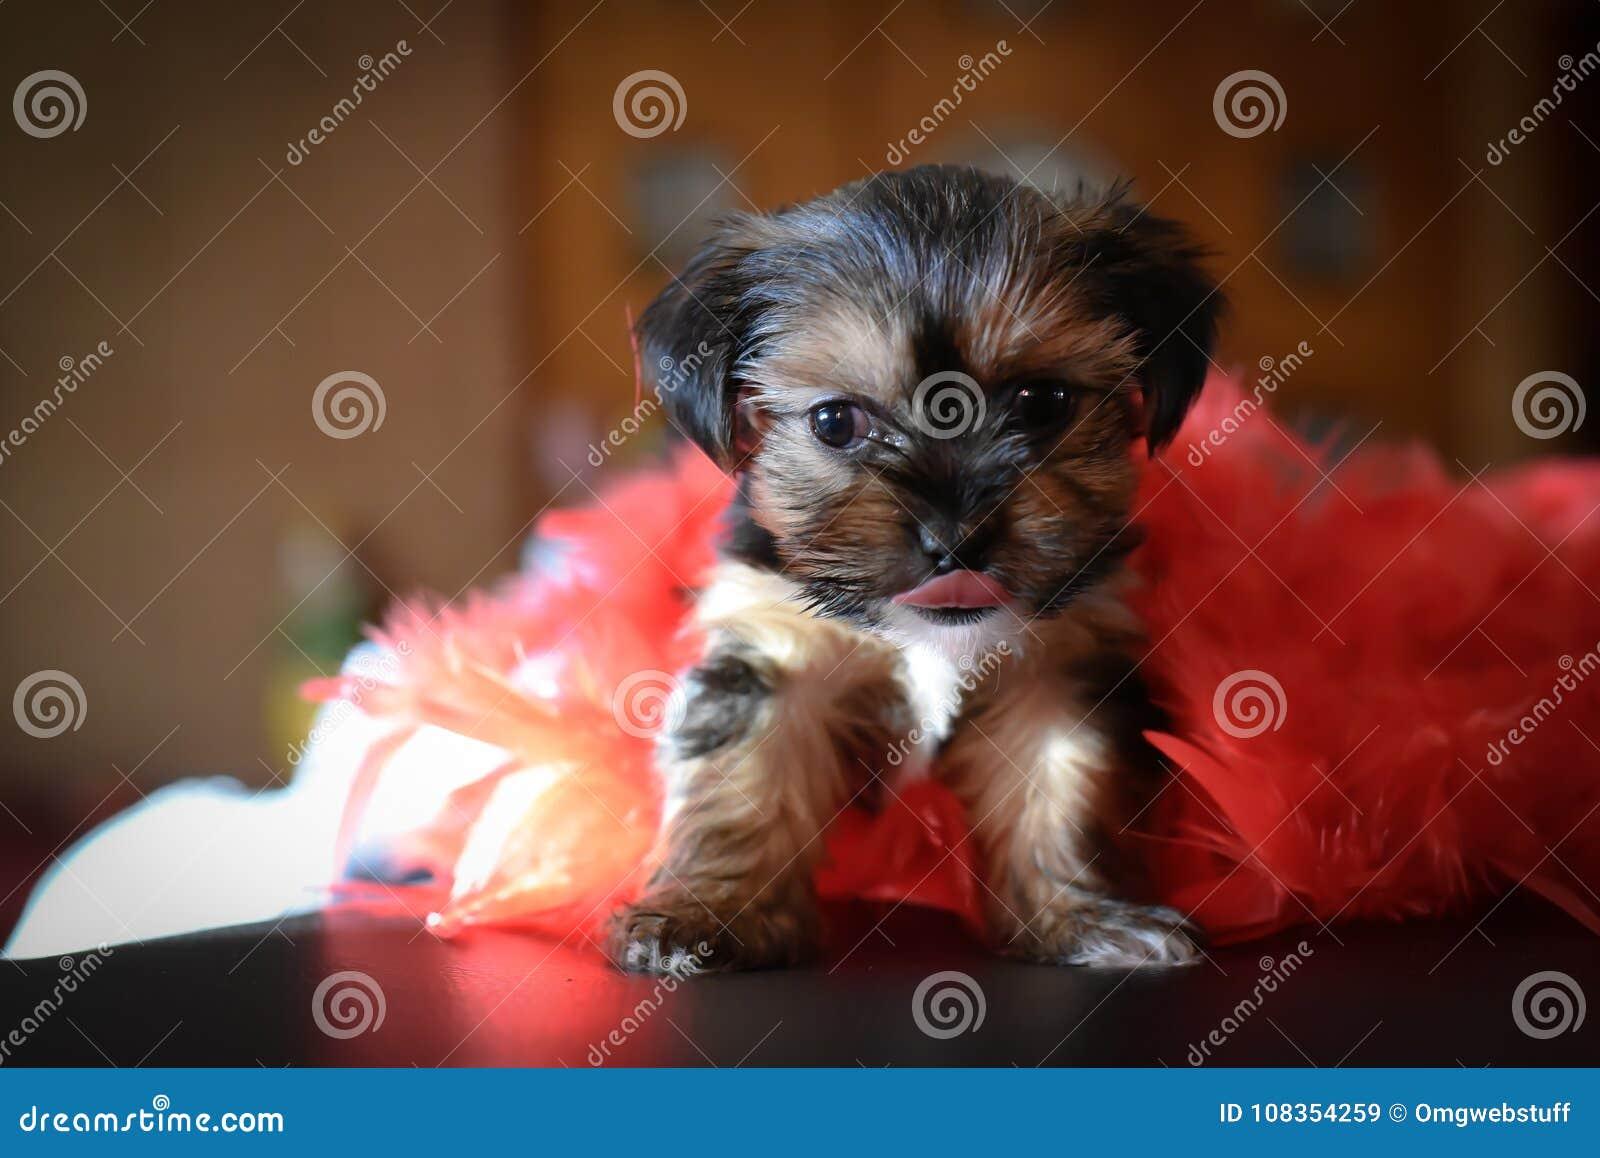 Yorkie bonito Shih Tzu Puppy com boa vermelha